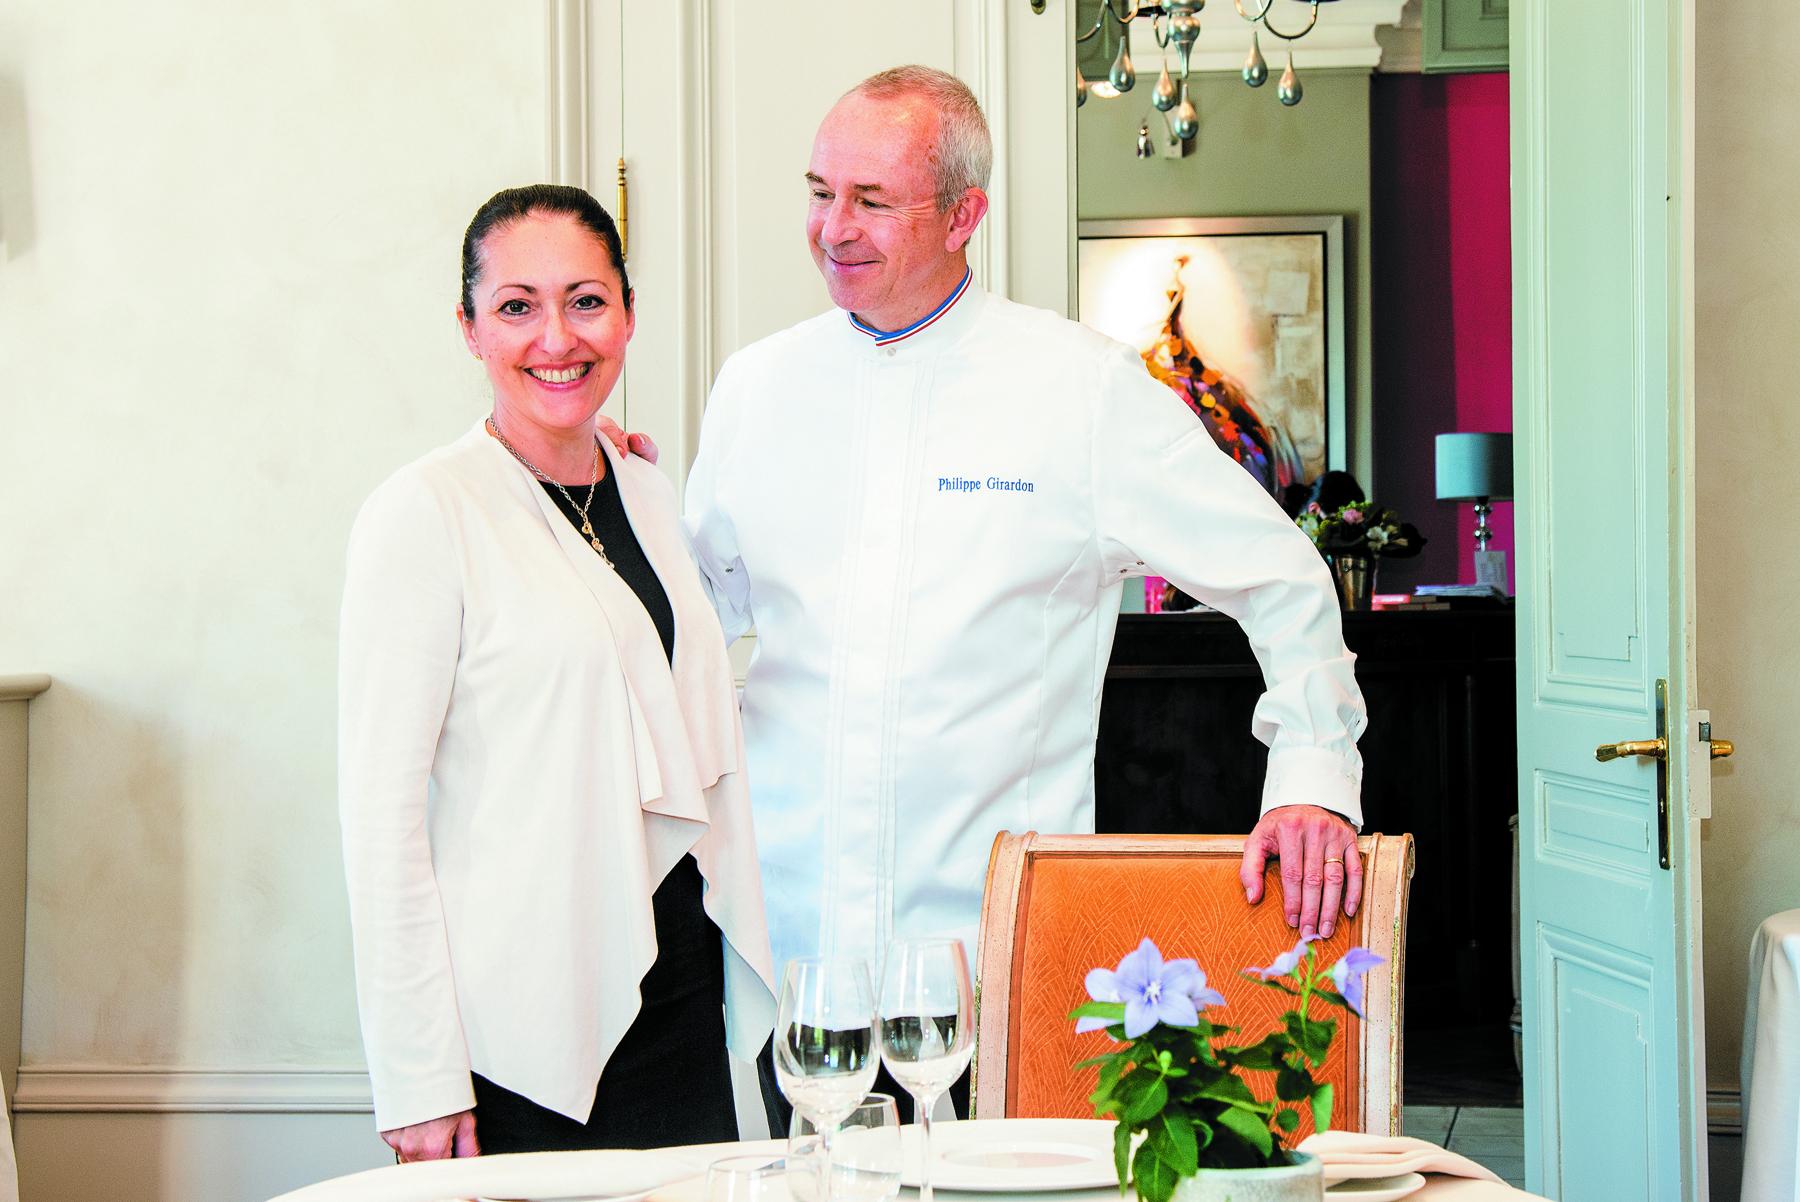 Restaurant Domaine de Clairefontaine - Philippe Girardon